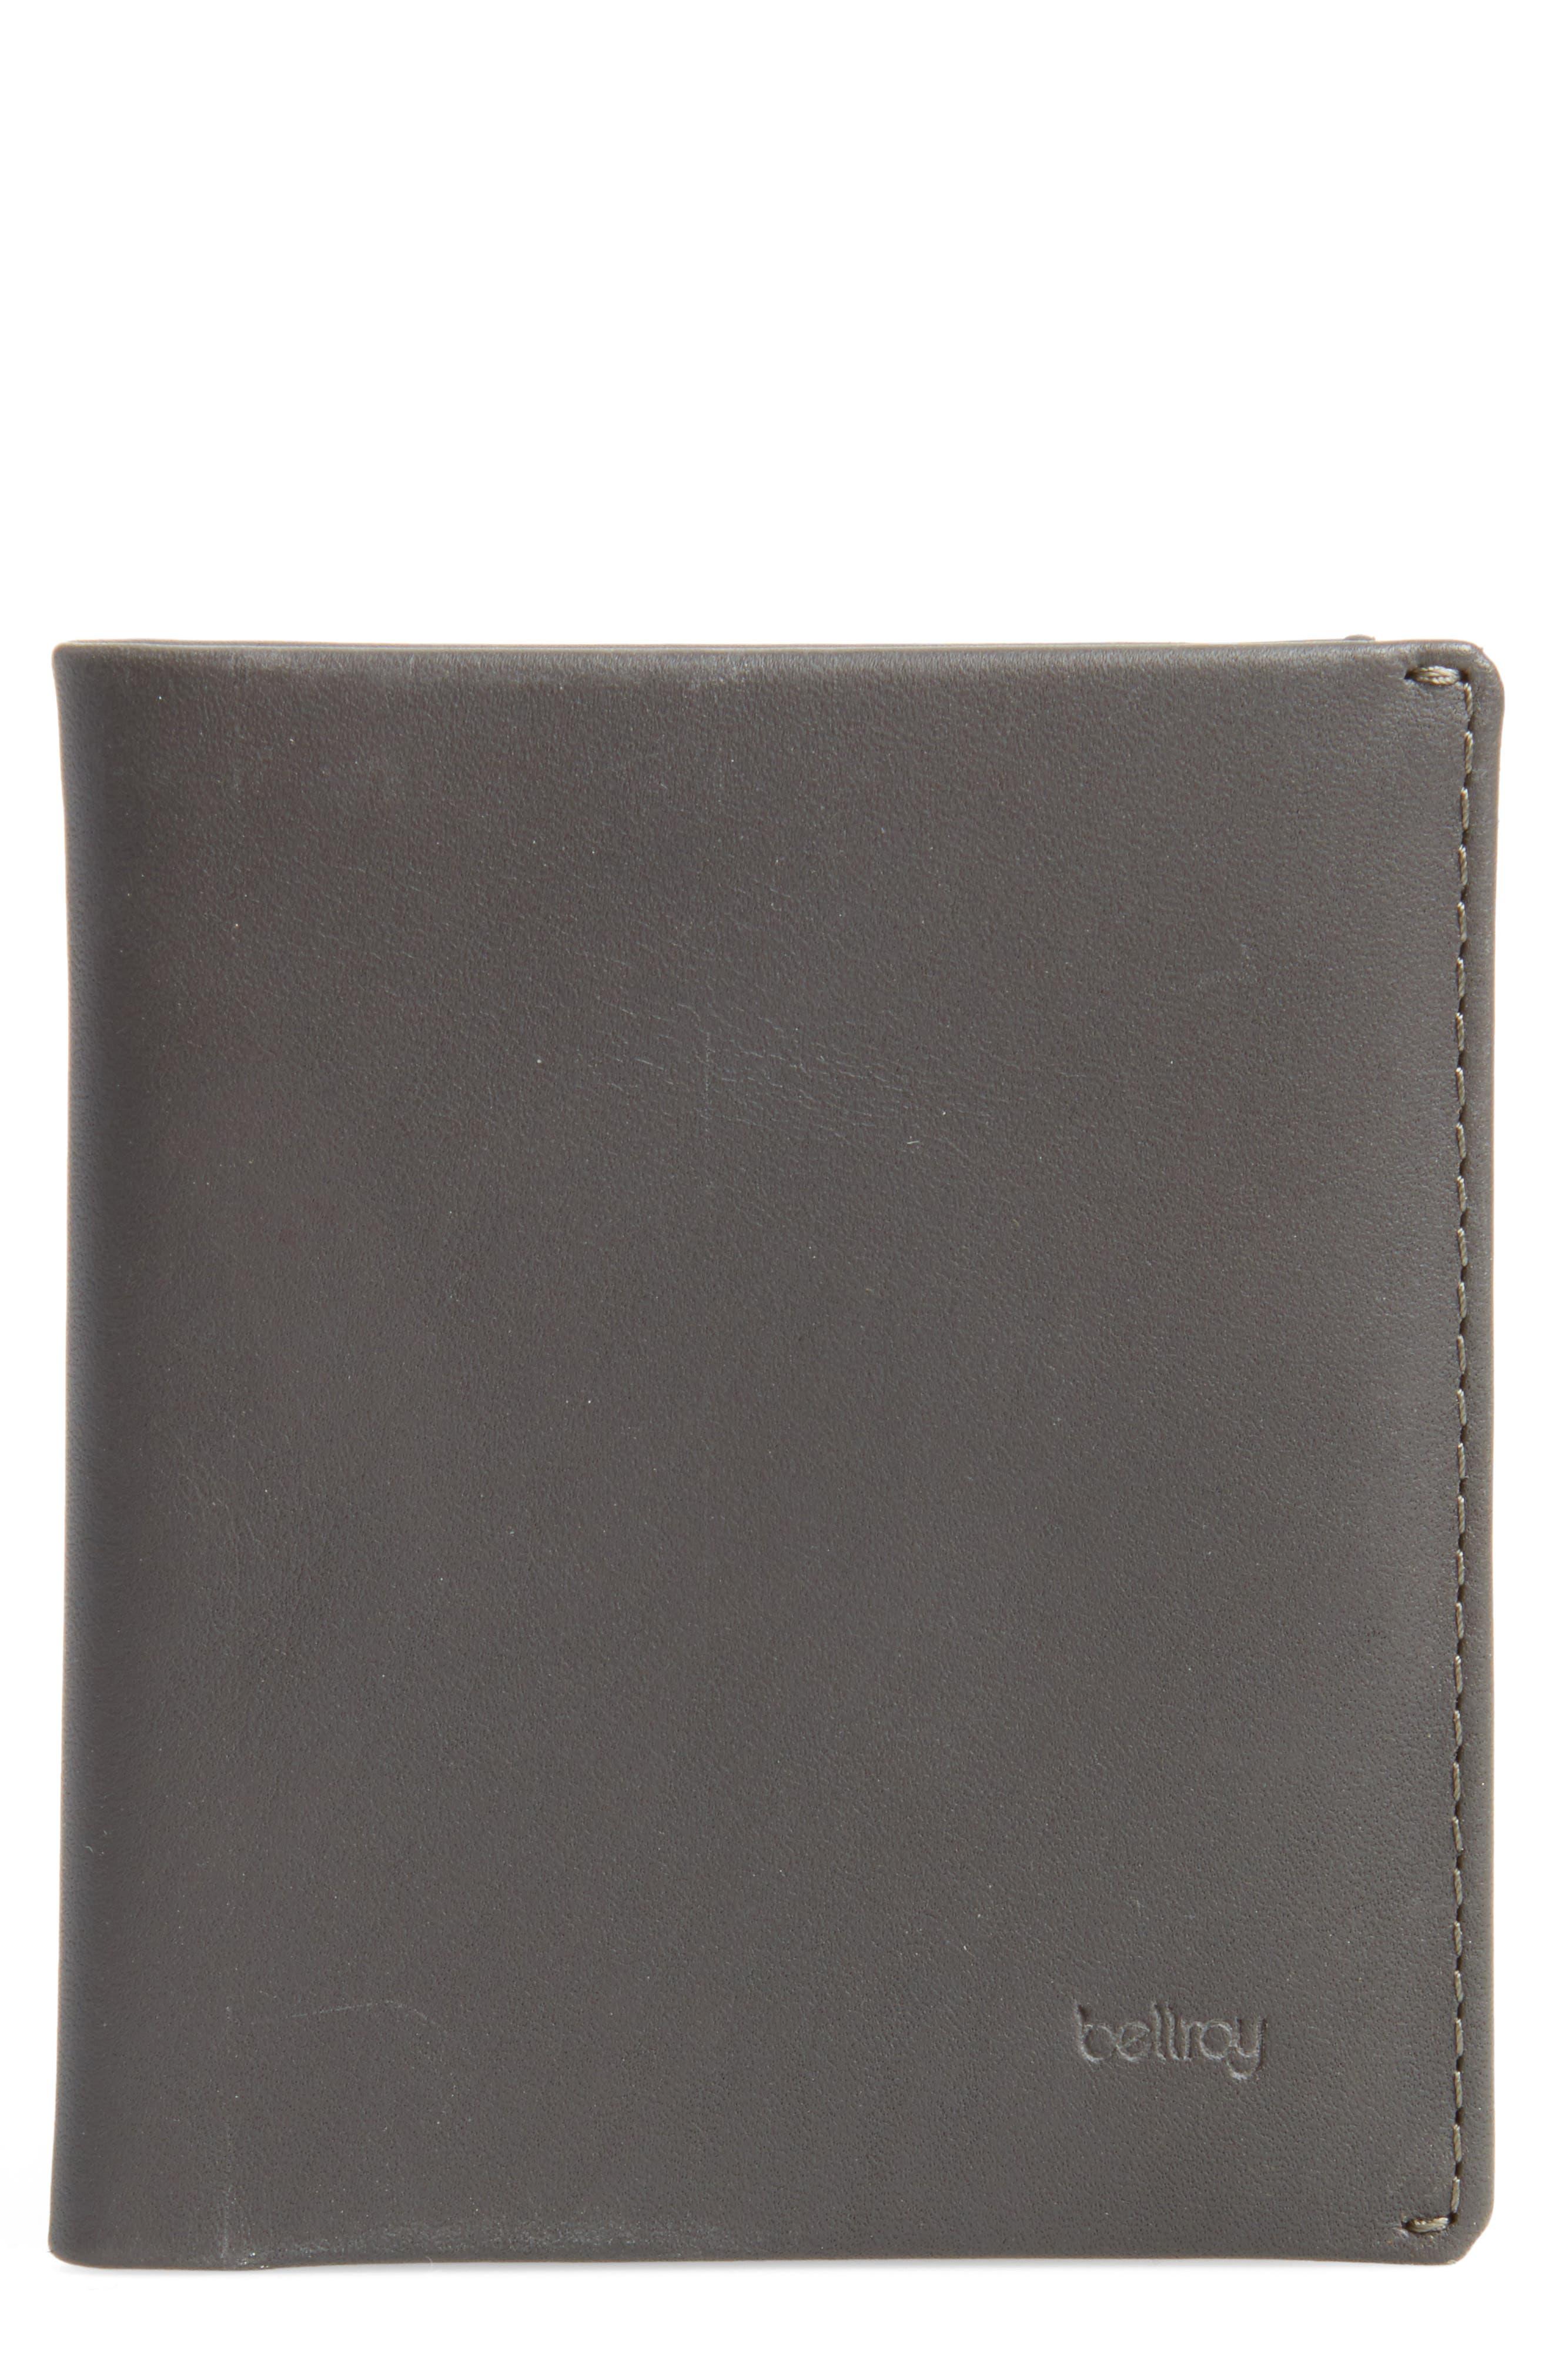 Note Sleeve Wallet,                             Main thumbnail 1, color,                             010